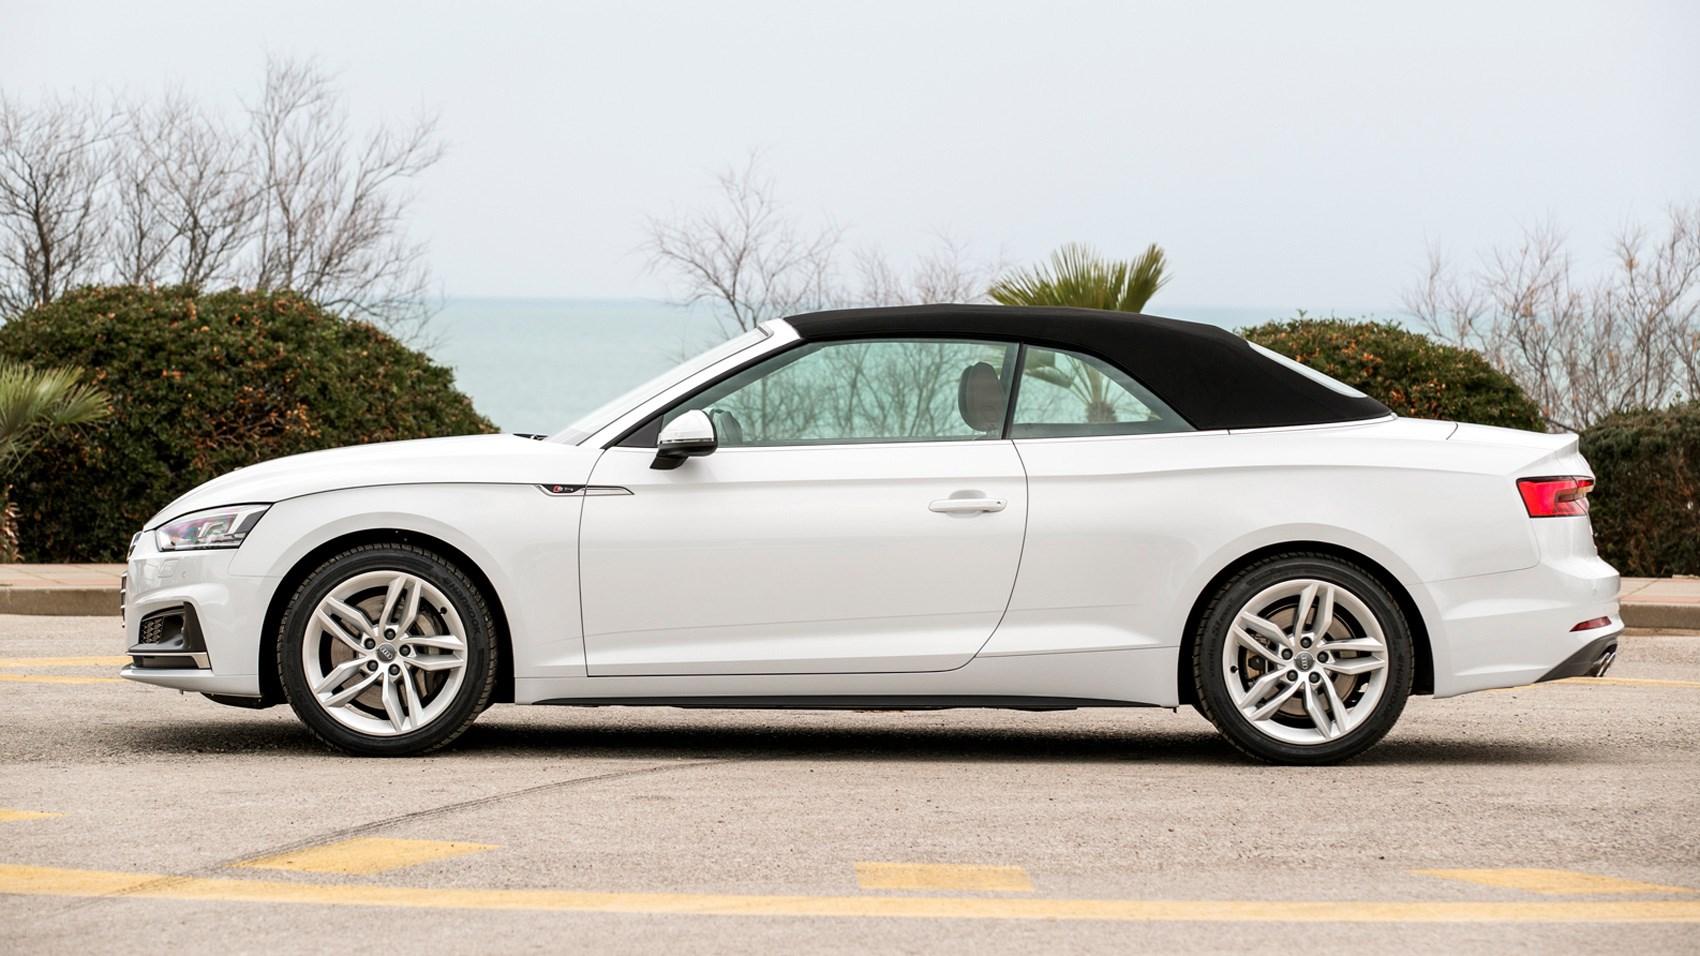 Audi a5 cabriolet 20 tfsi quattro review